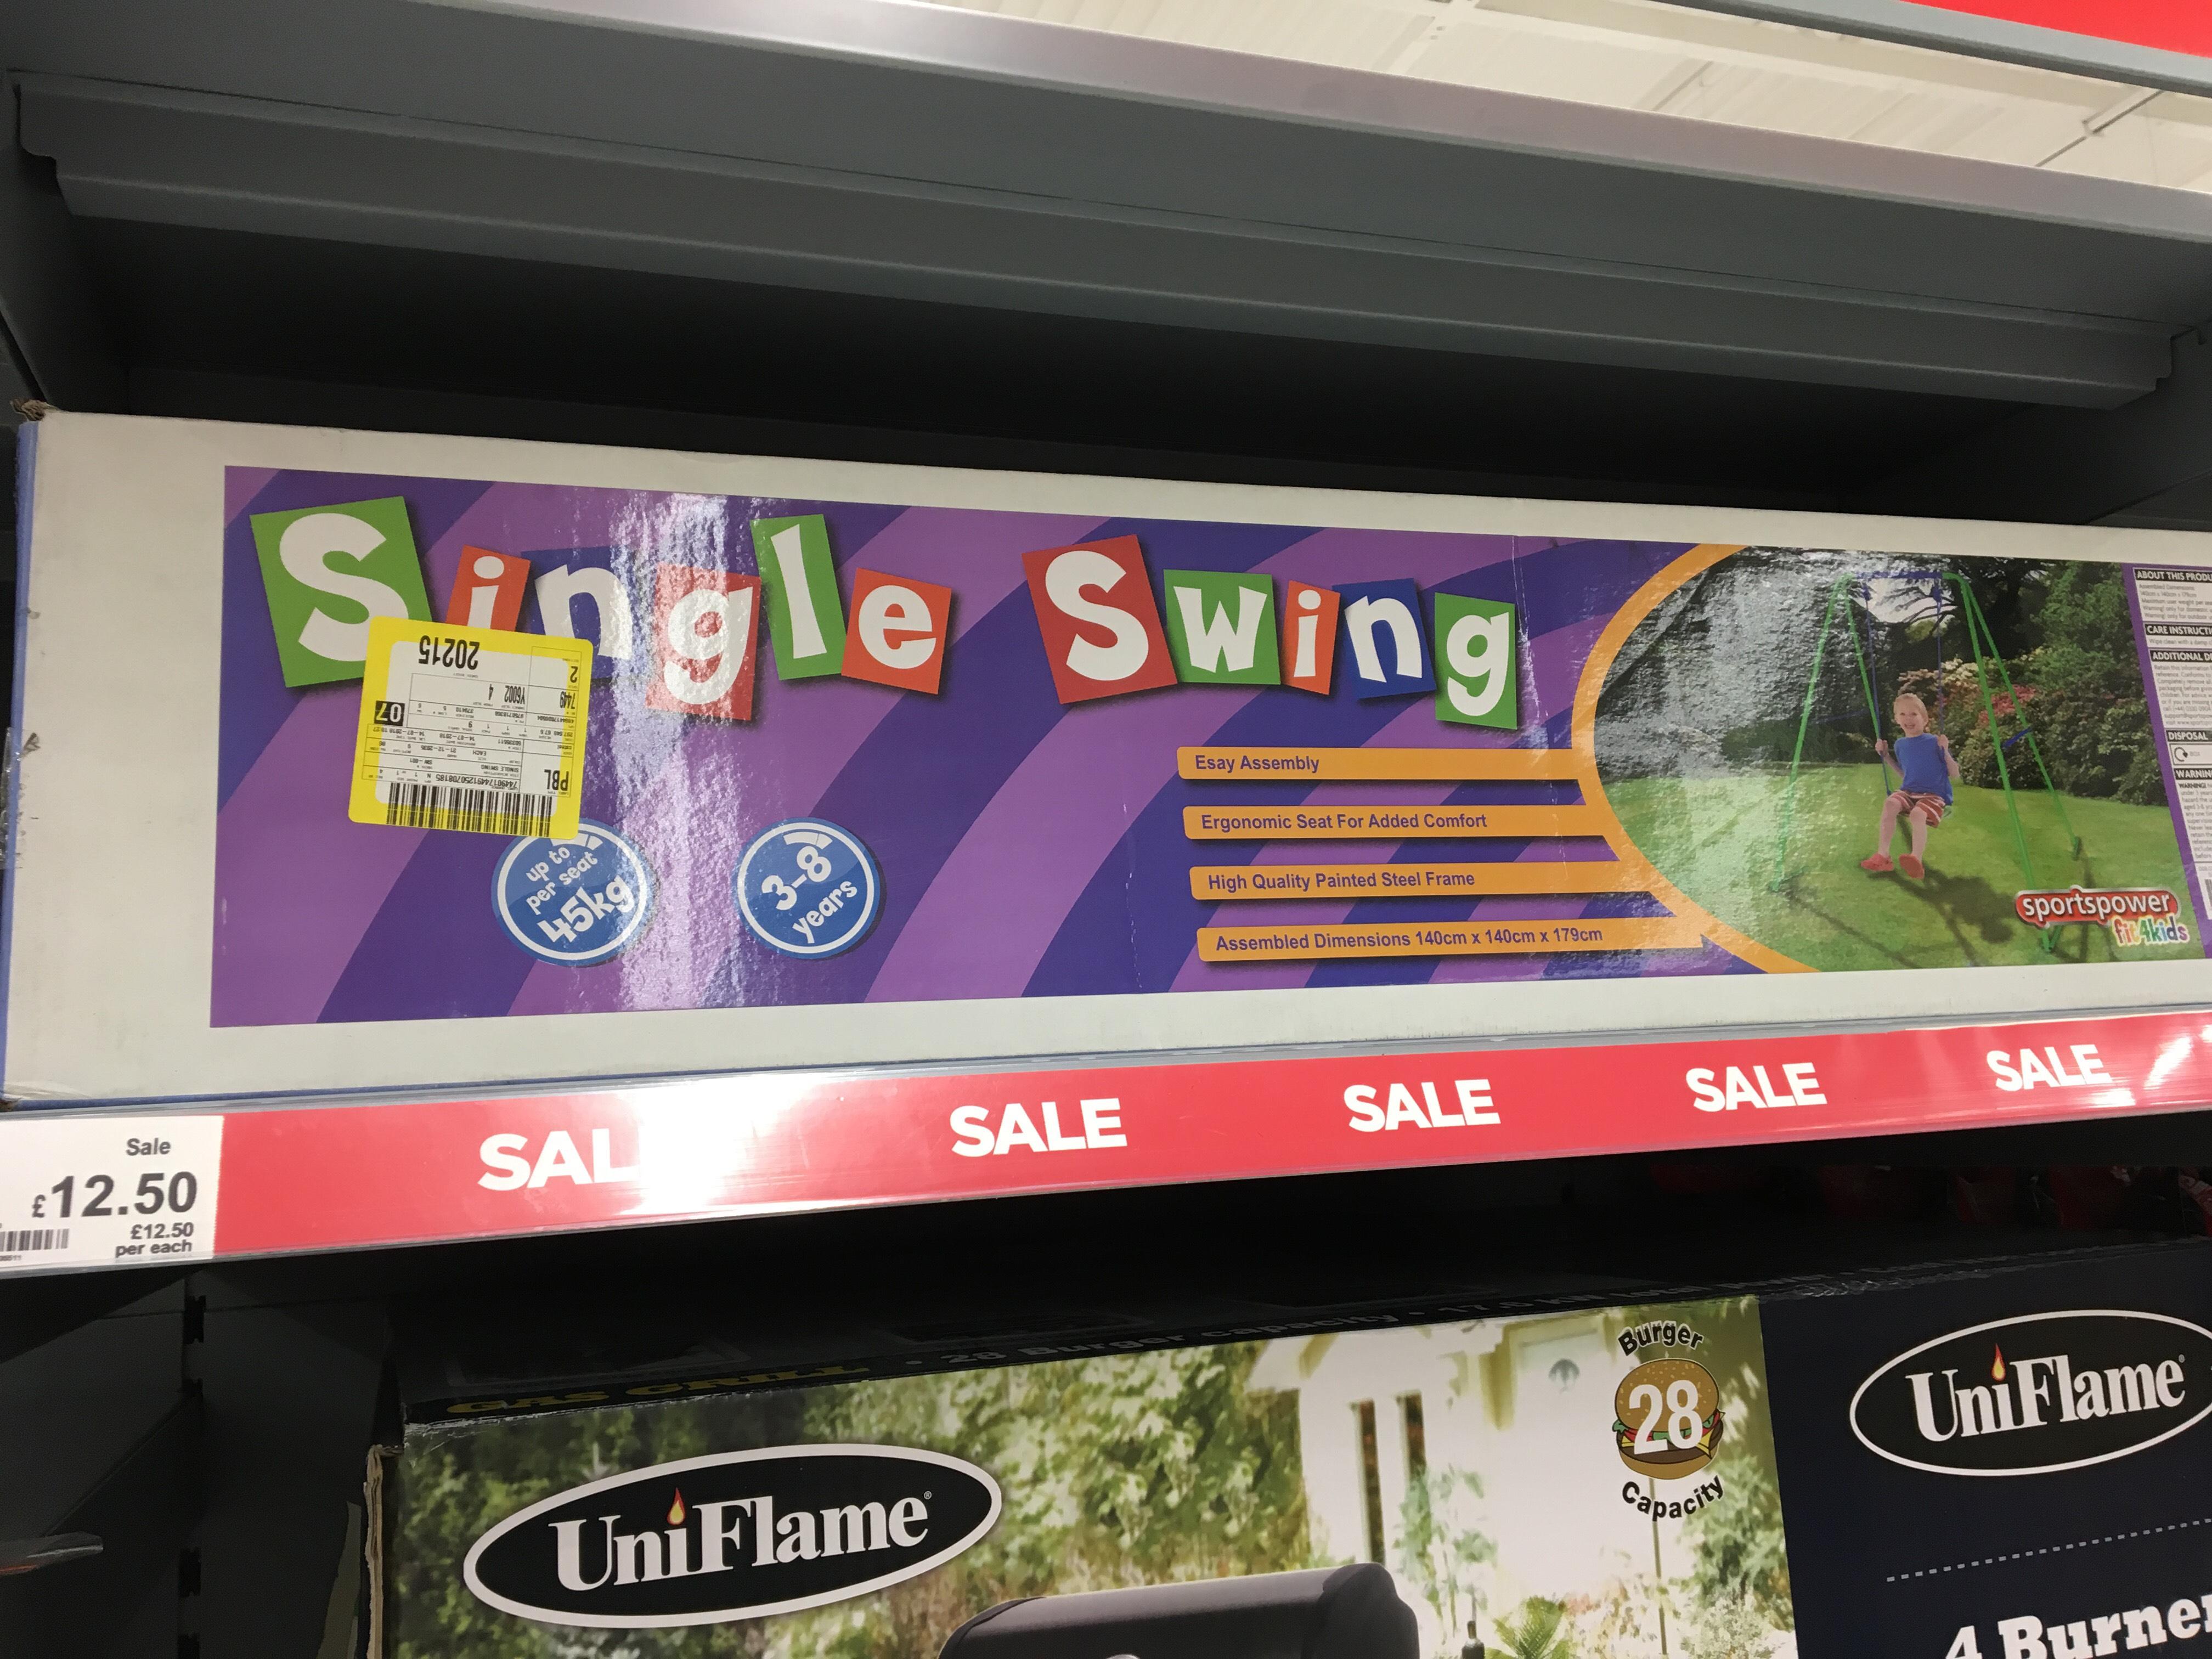 Single Swing - Age 3+ - Reduced to £12.50 @ Asda (Washington)